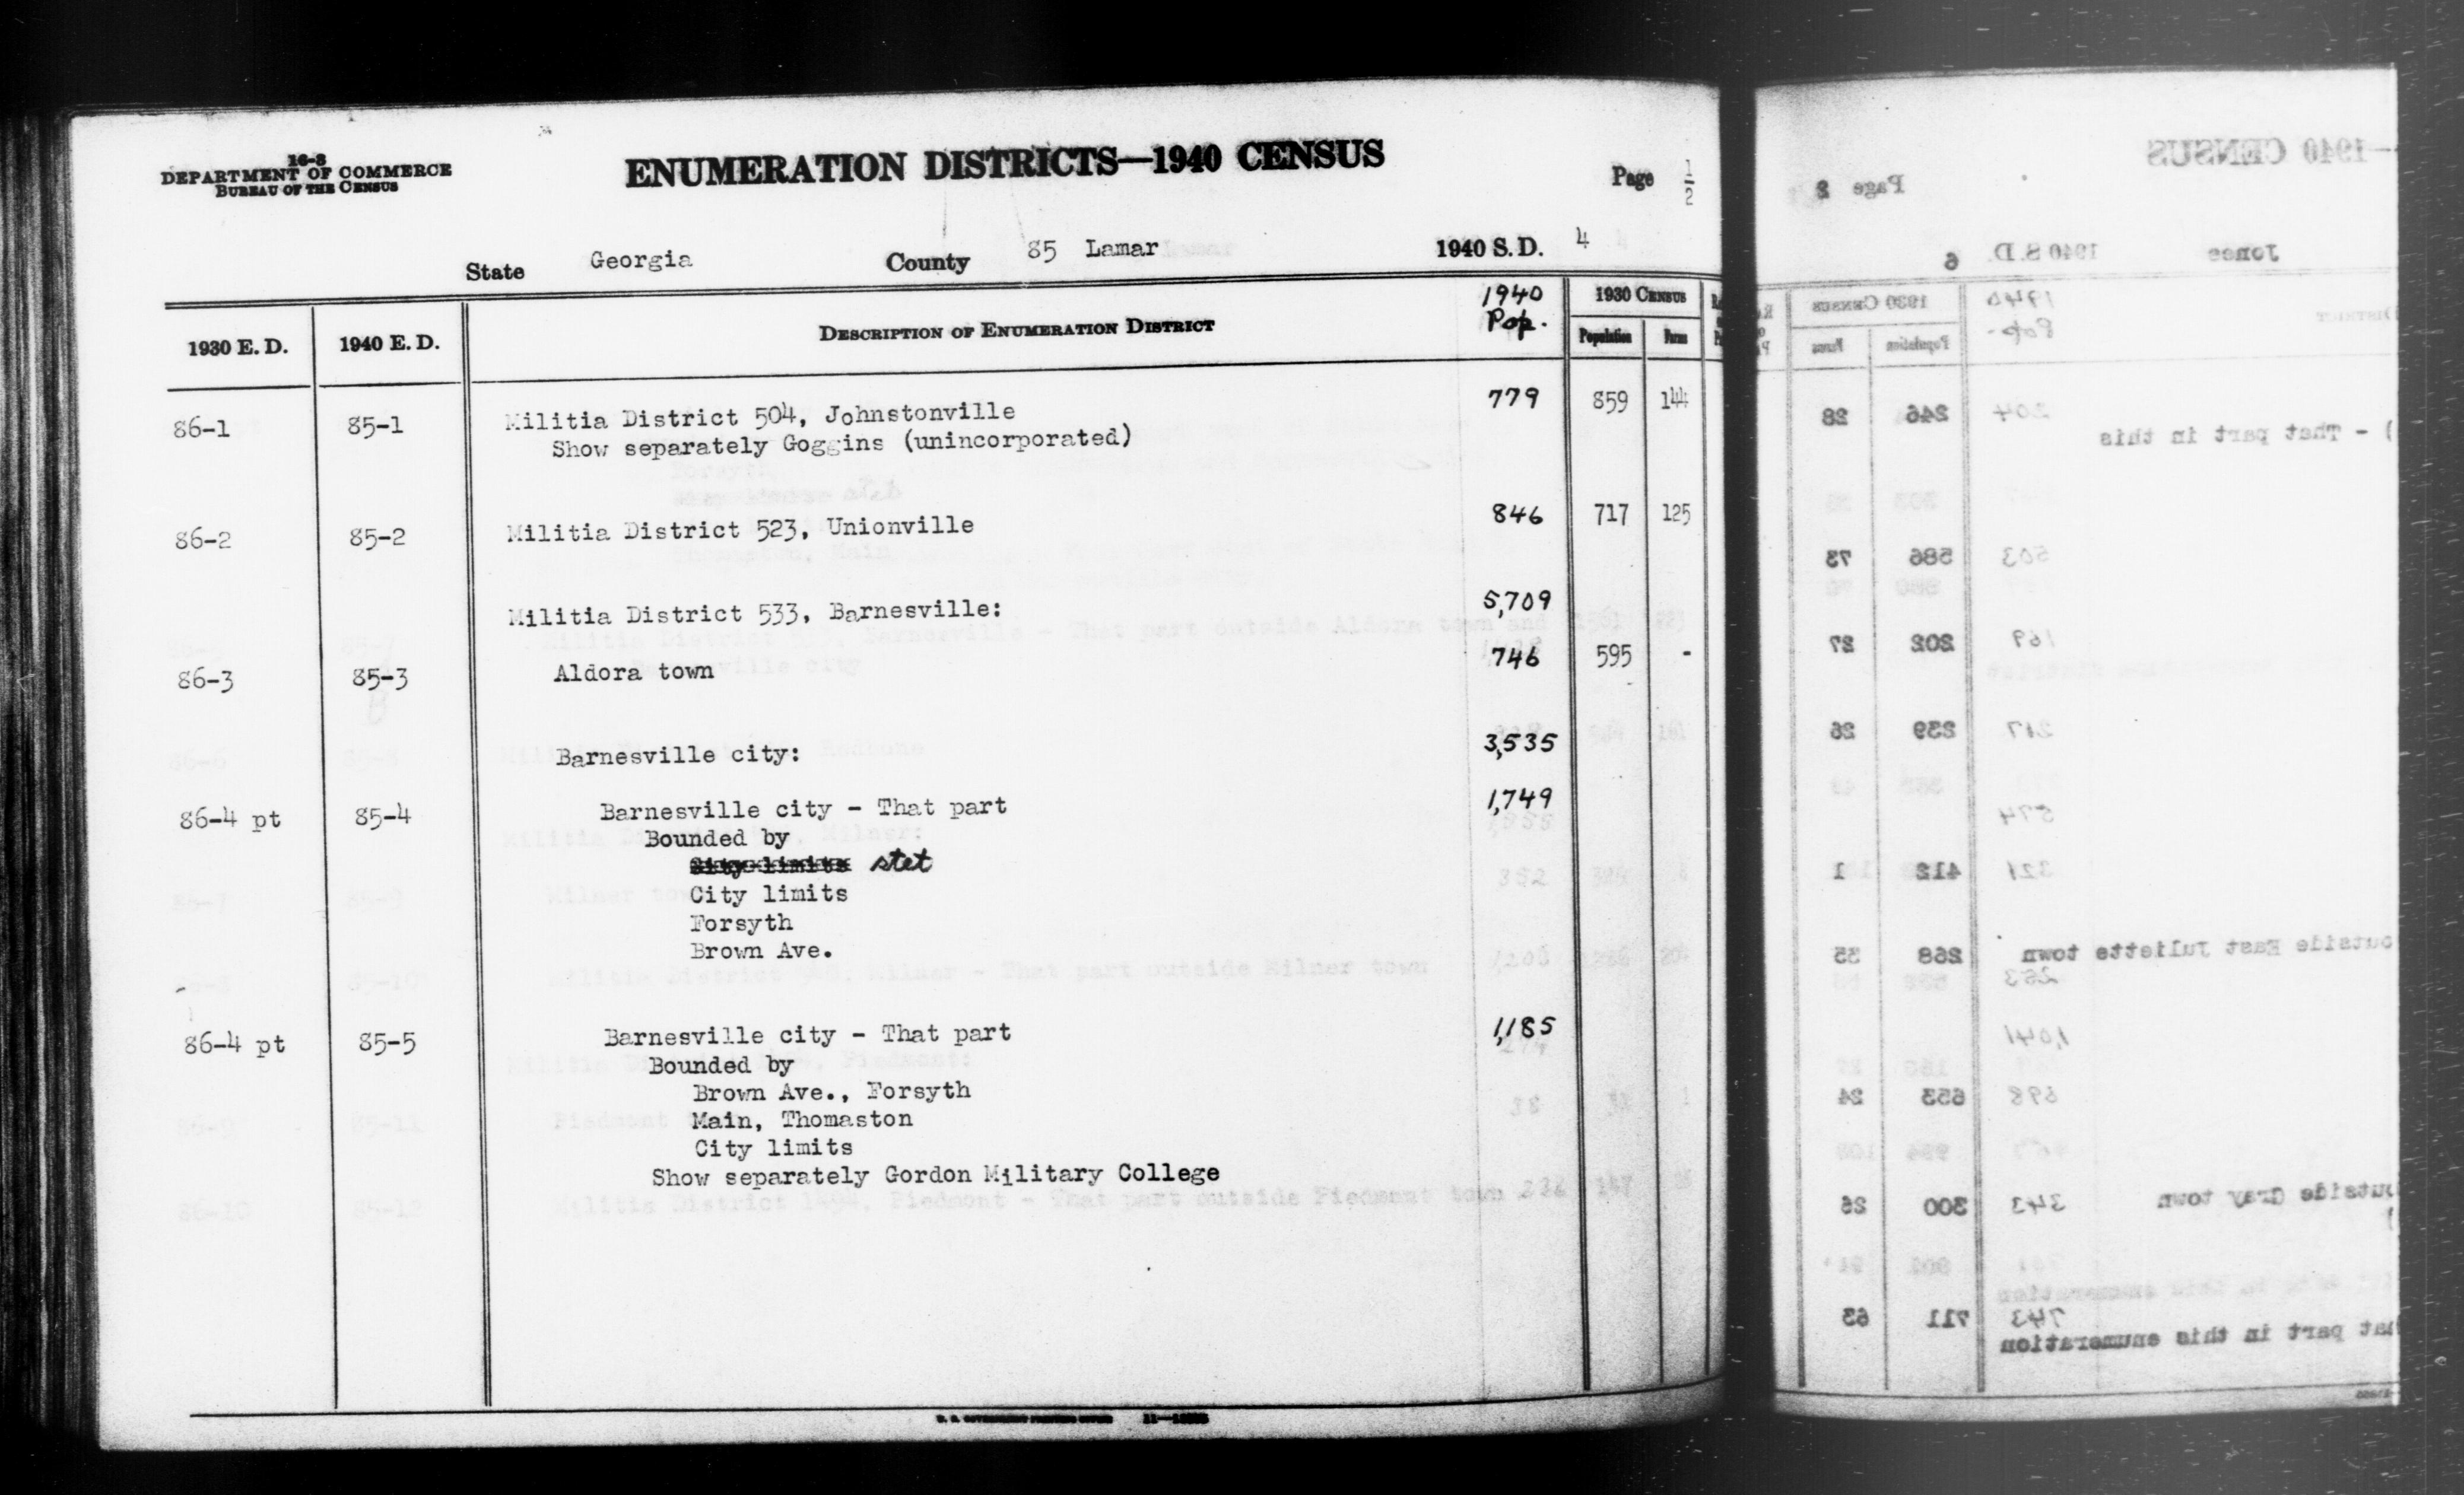 1940 Census Enumeration District Descriptions - Georgia - Lamar County - ED 85-1, ED 85-2, ED 85-3, ED 85-4, ED 85-5